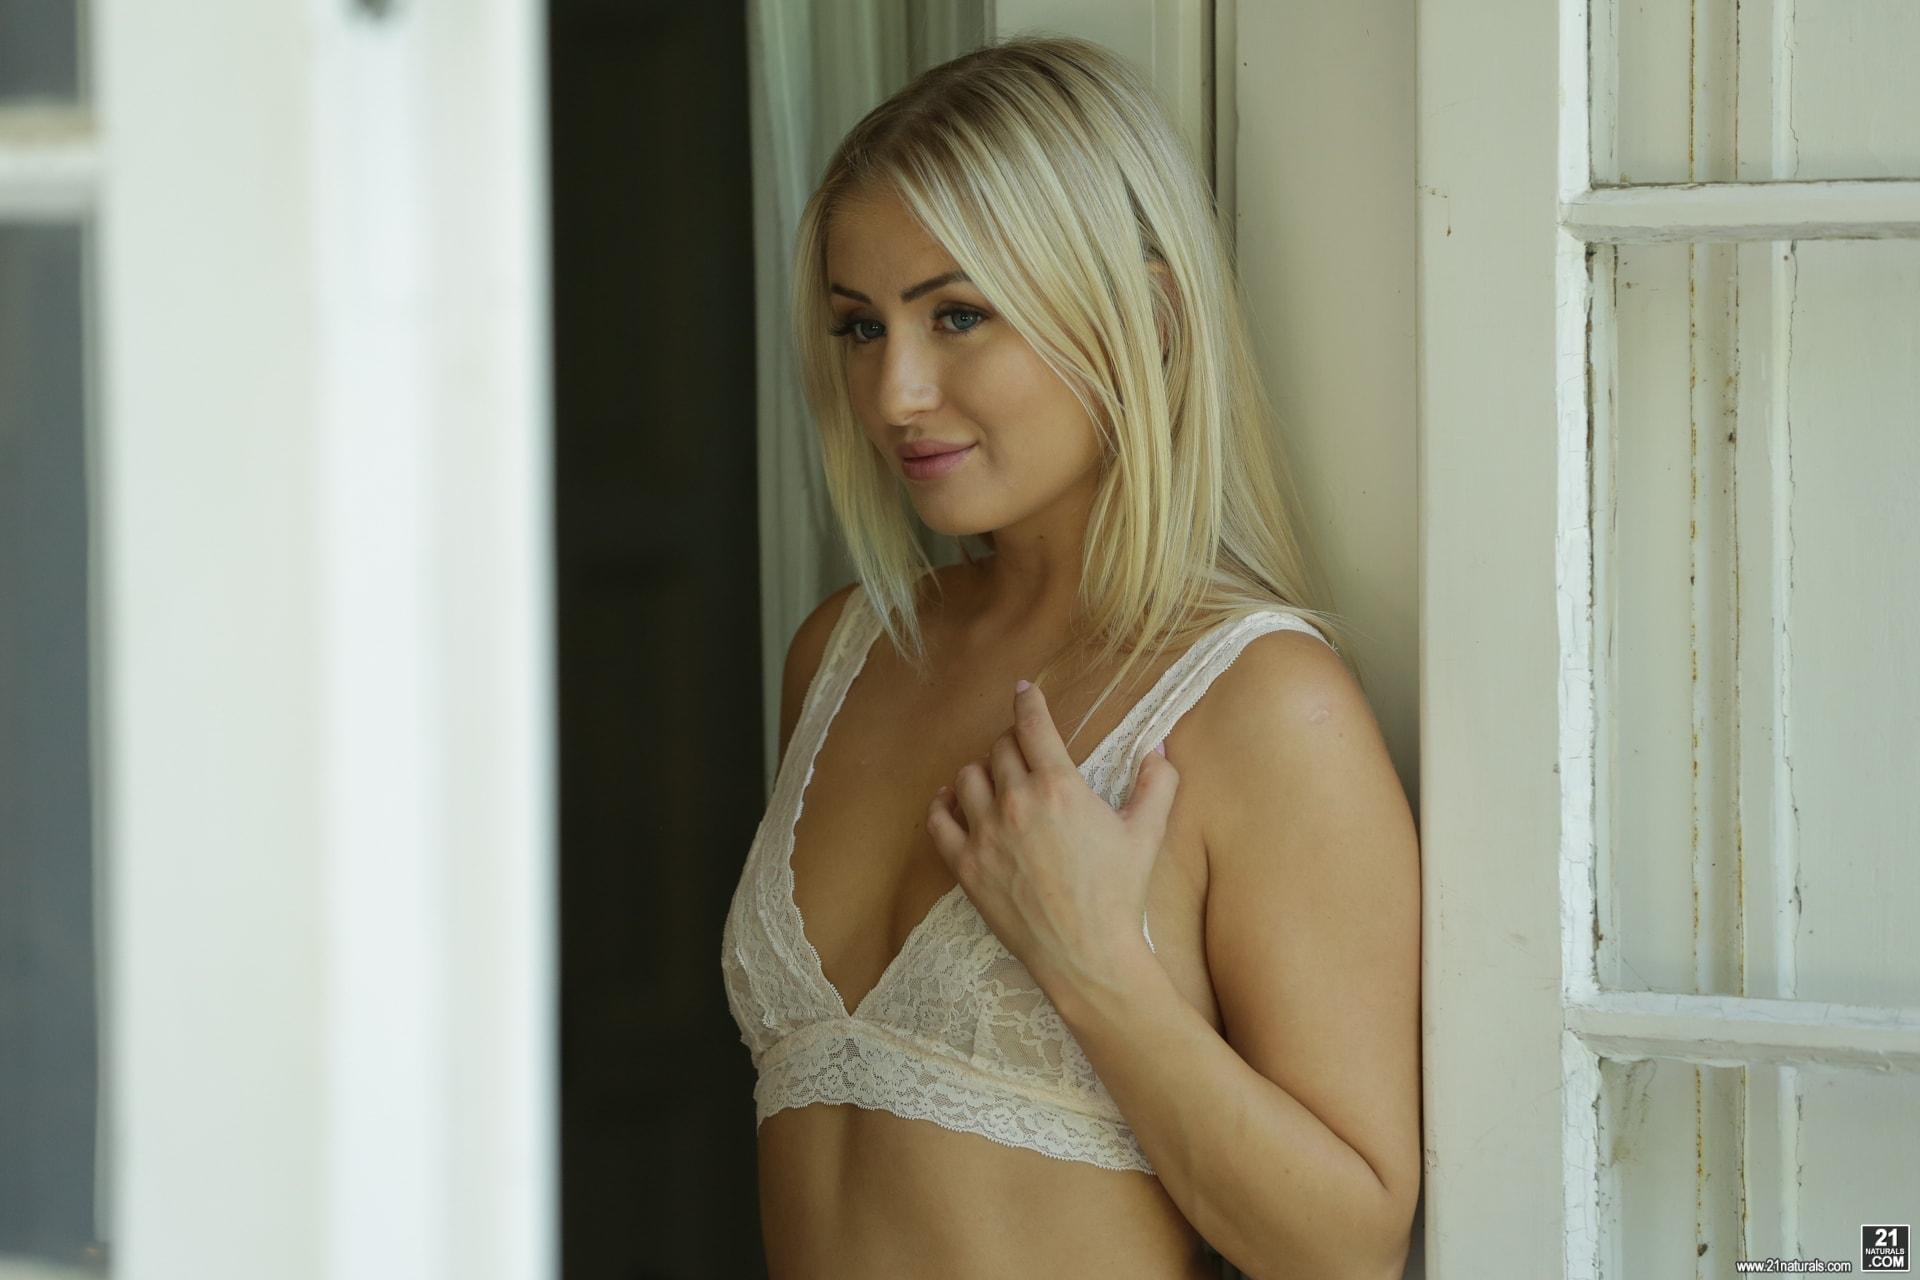 21Sextury 'Outdoor Pleasures' starring Cayla Lyons (Photo 20)